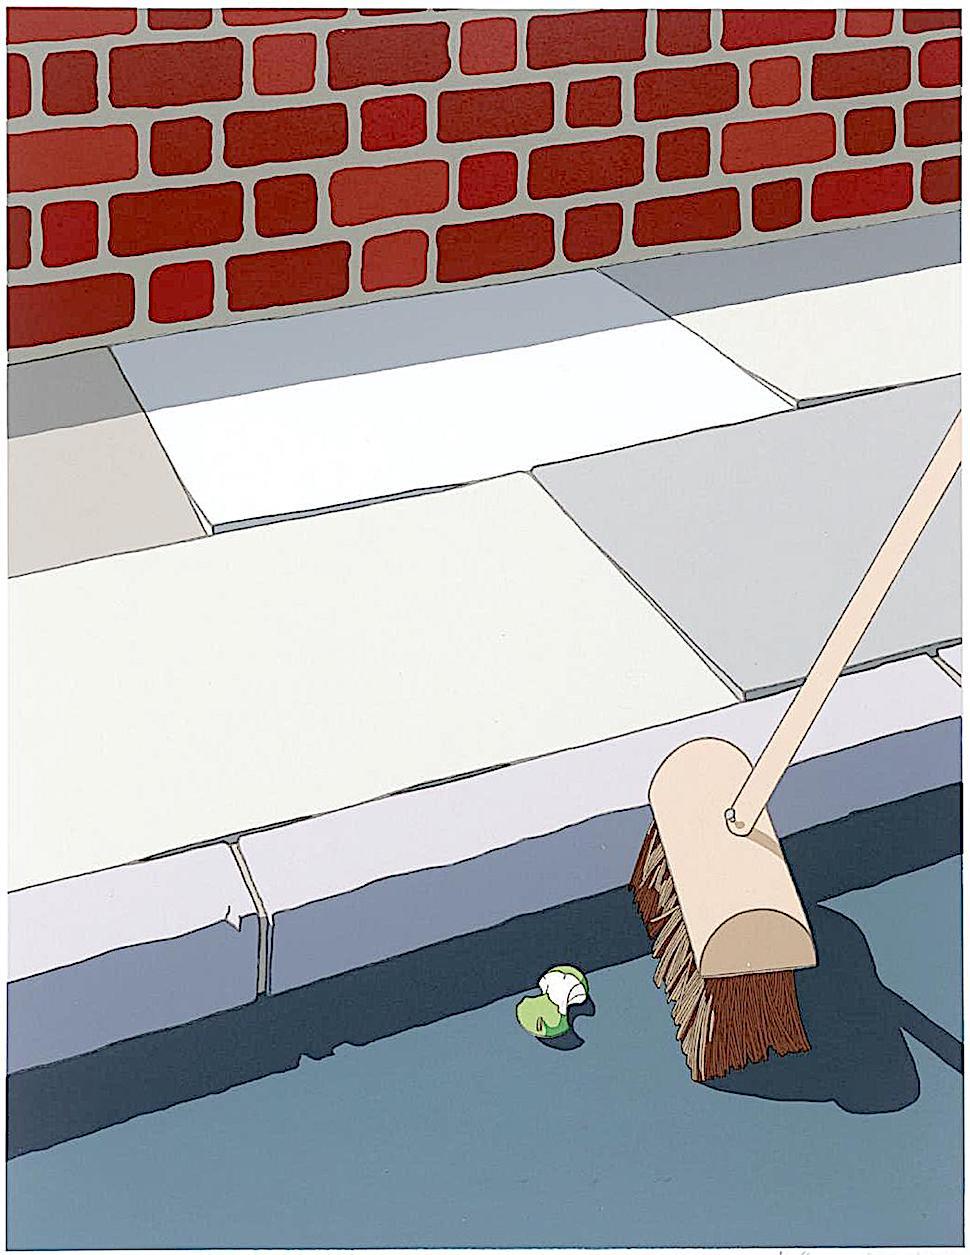 Jeffery Edwards art 1972, a broom cleaning the street